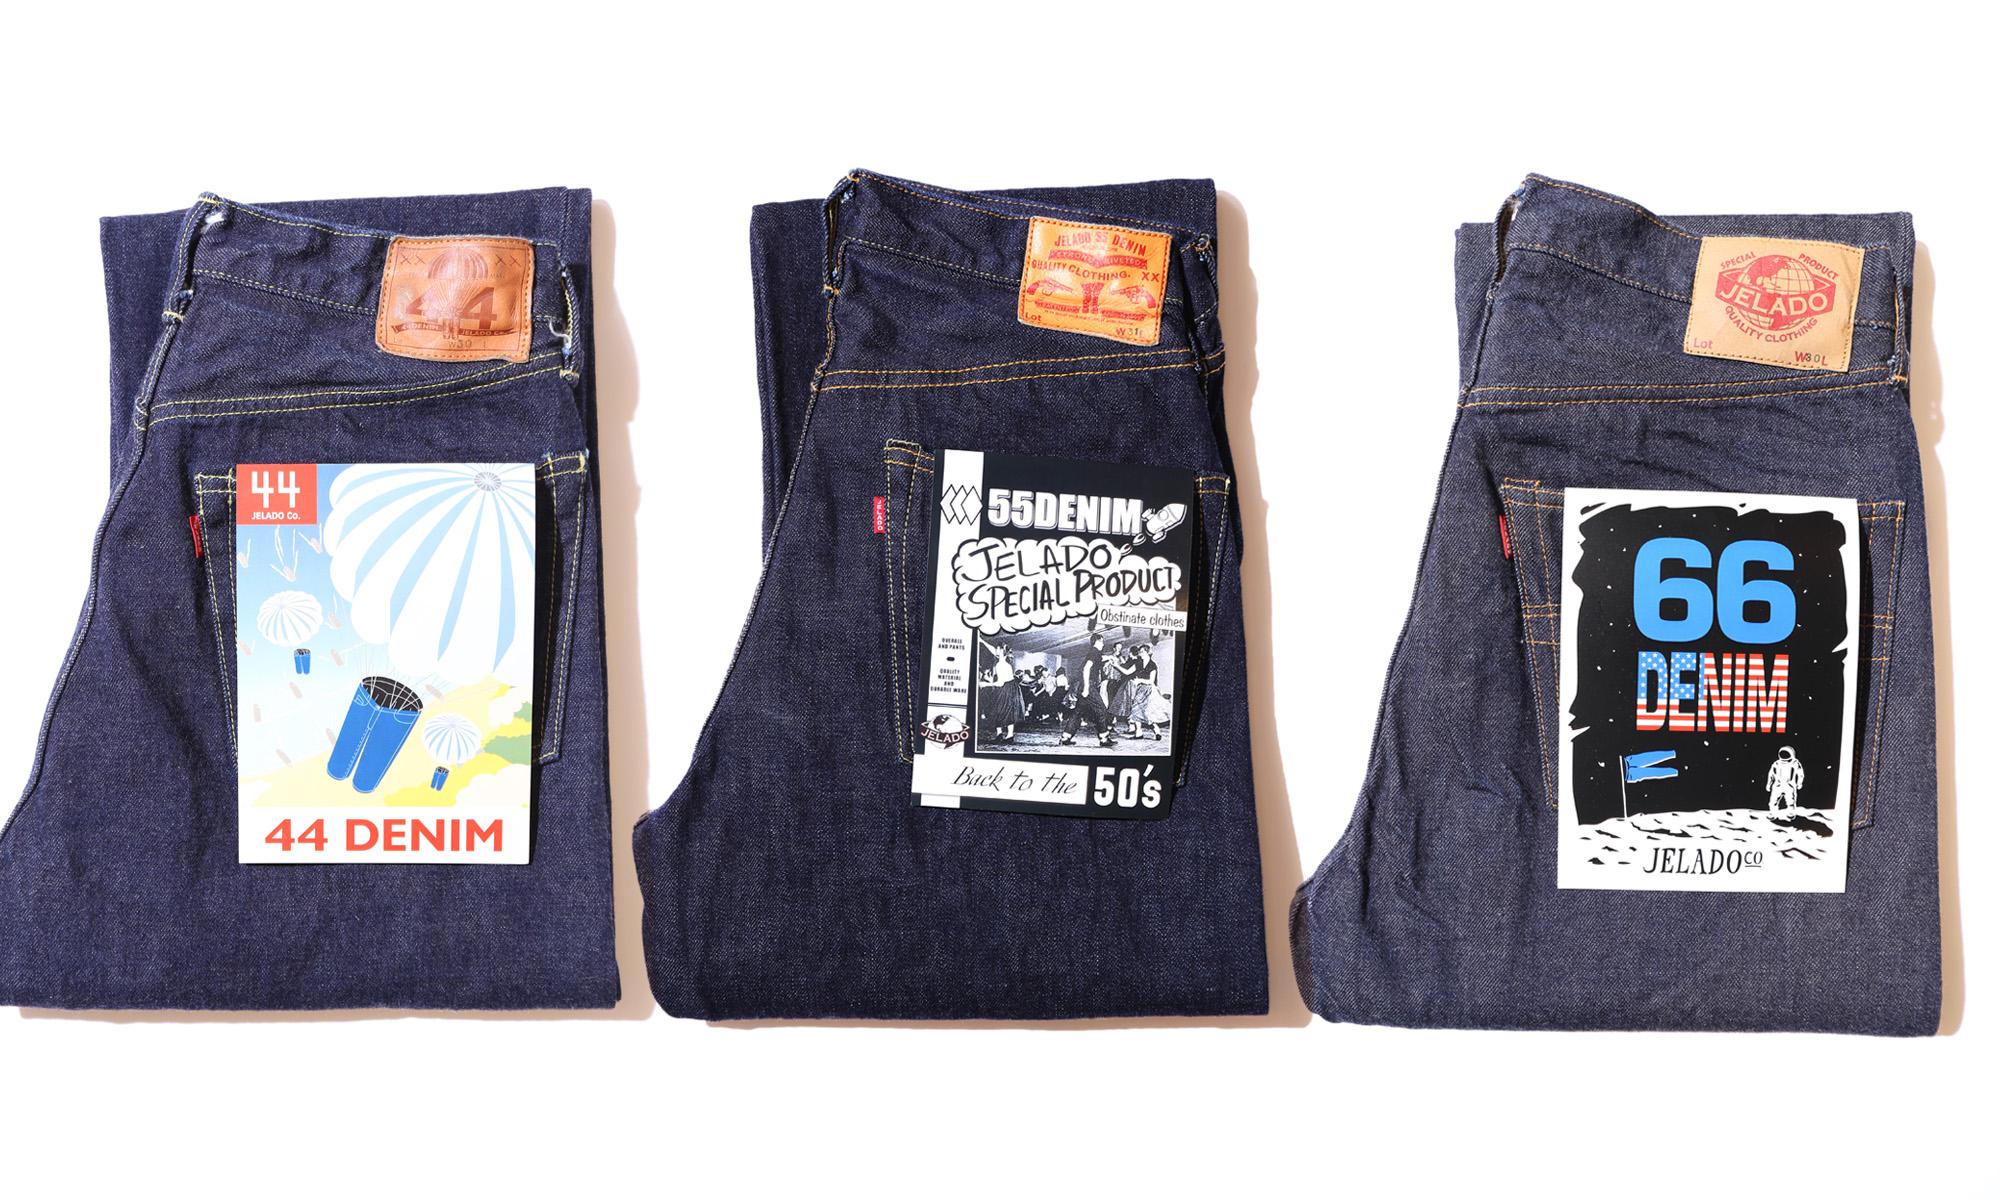 JERADO -5 POCKET DENIM PANTS inspired by vintage-